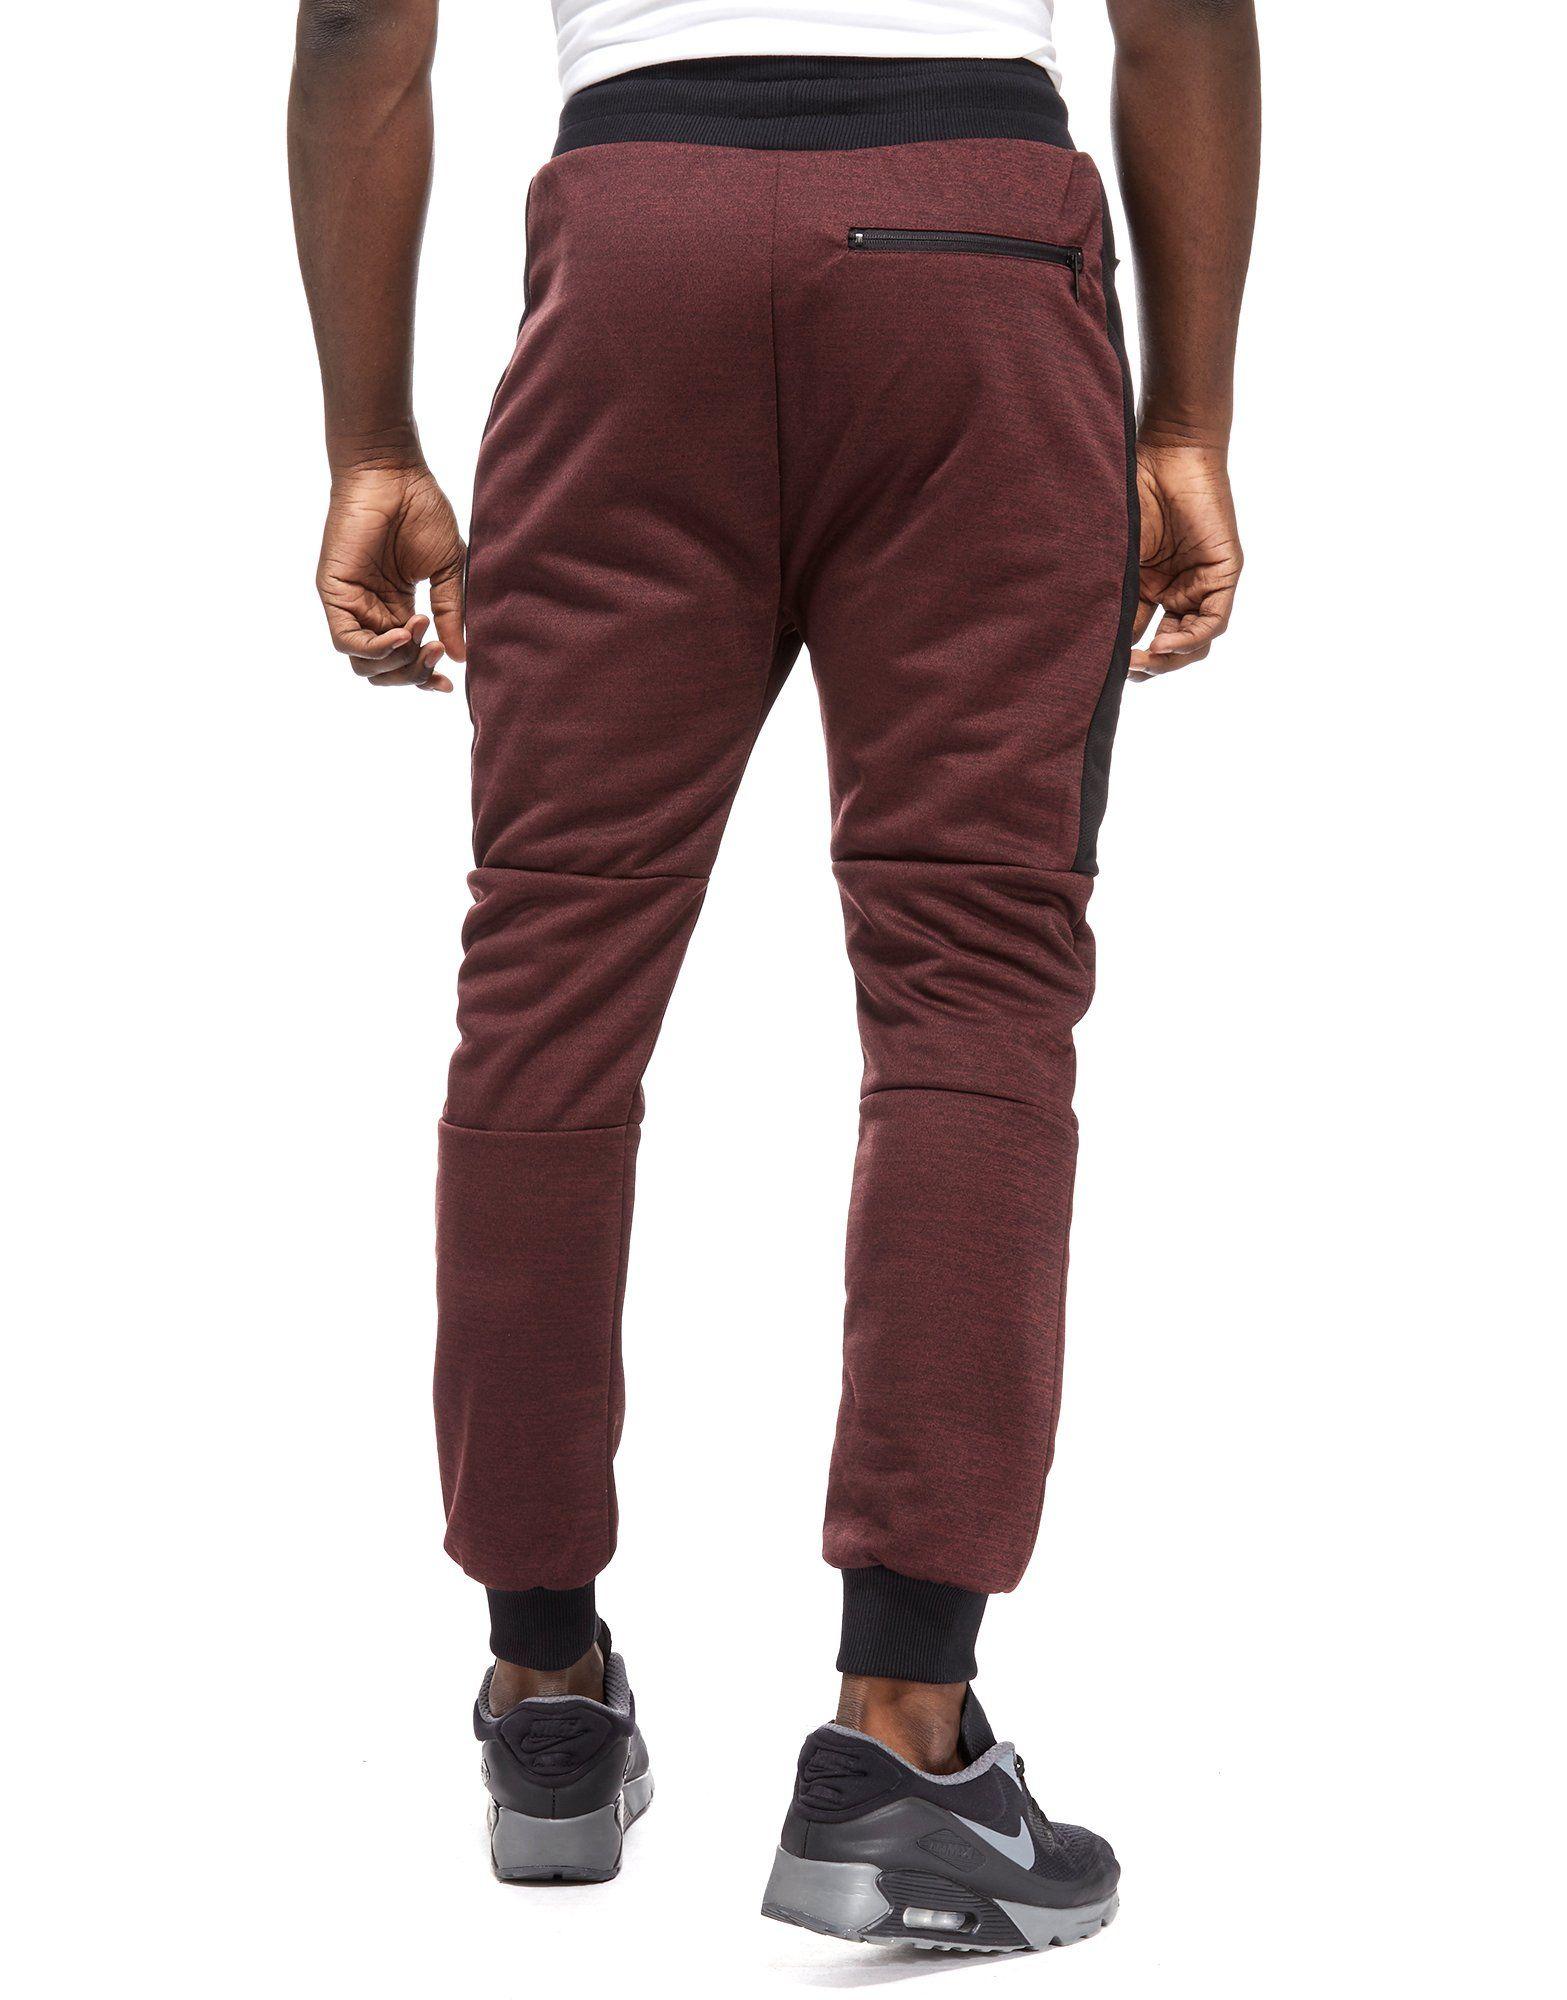 Supply & Demand Spark Jogging Pants